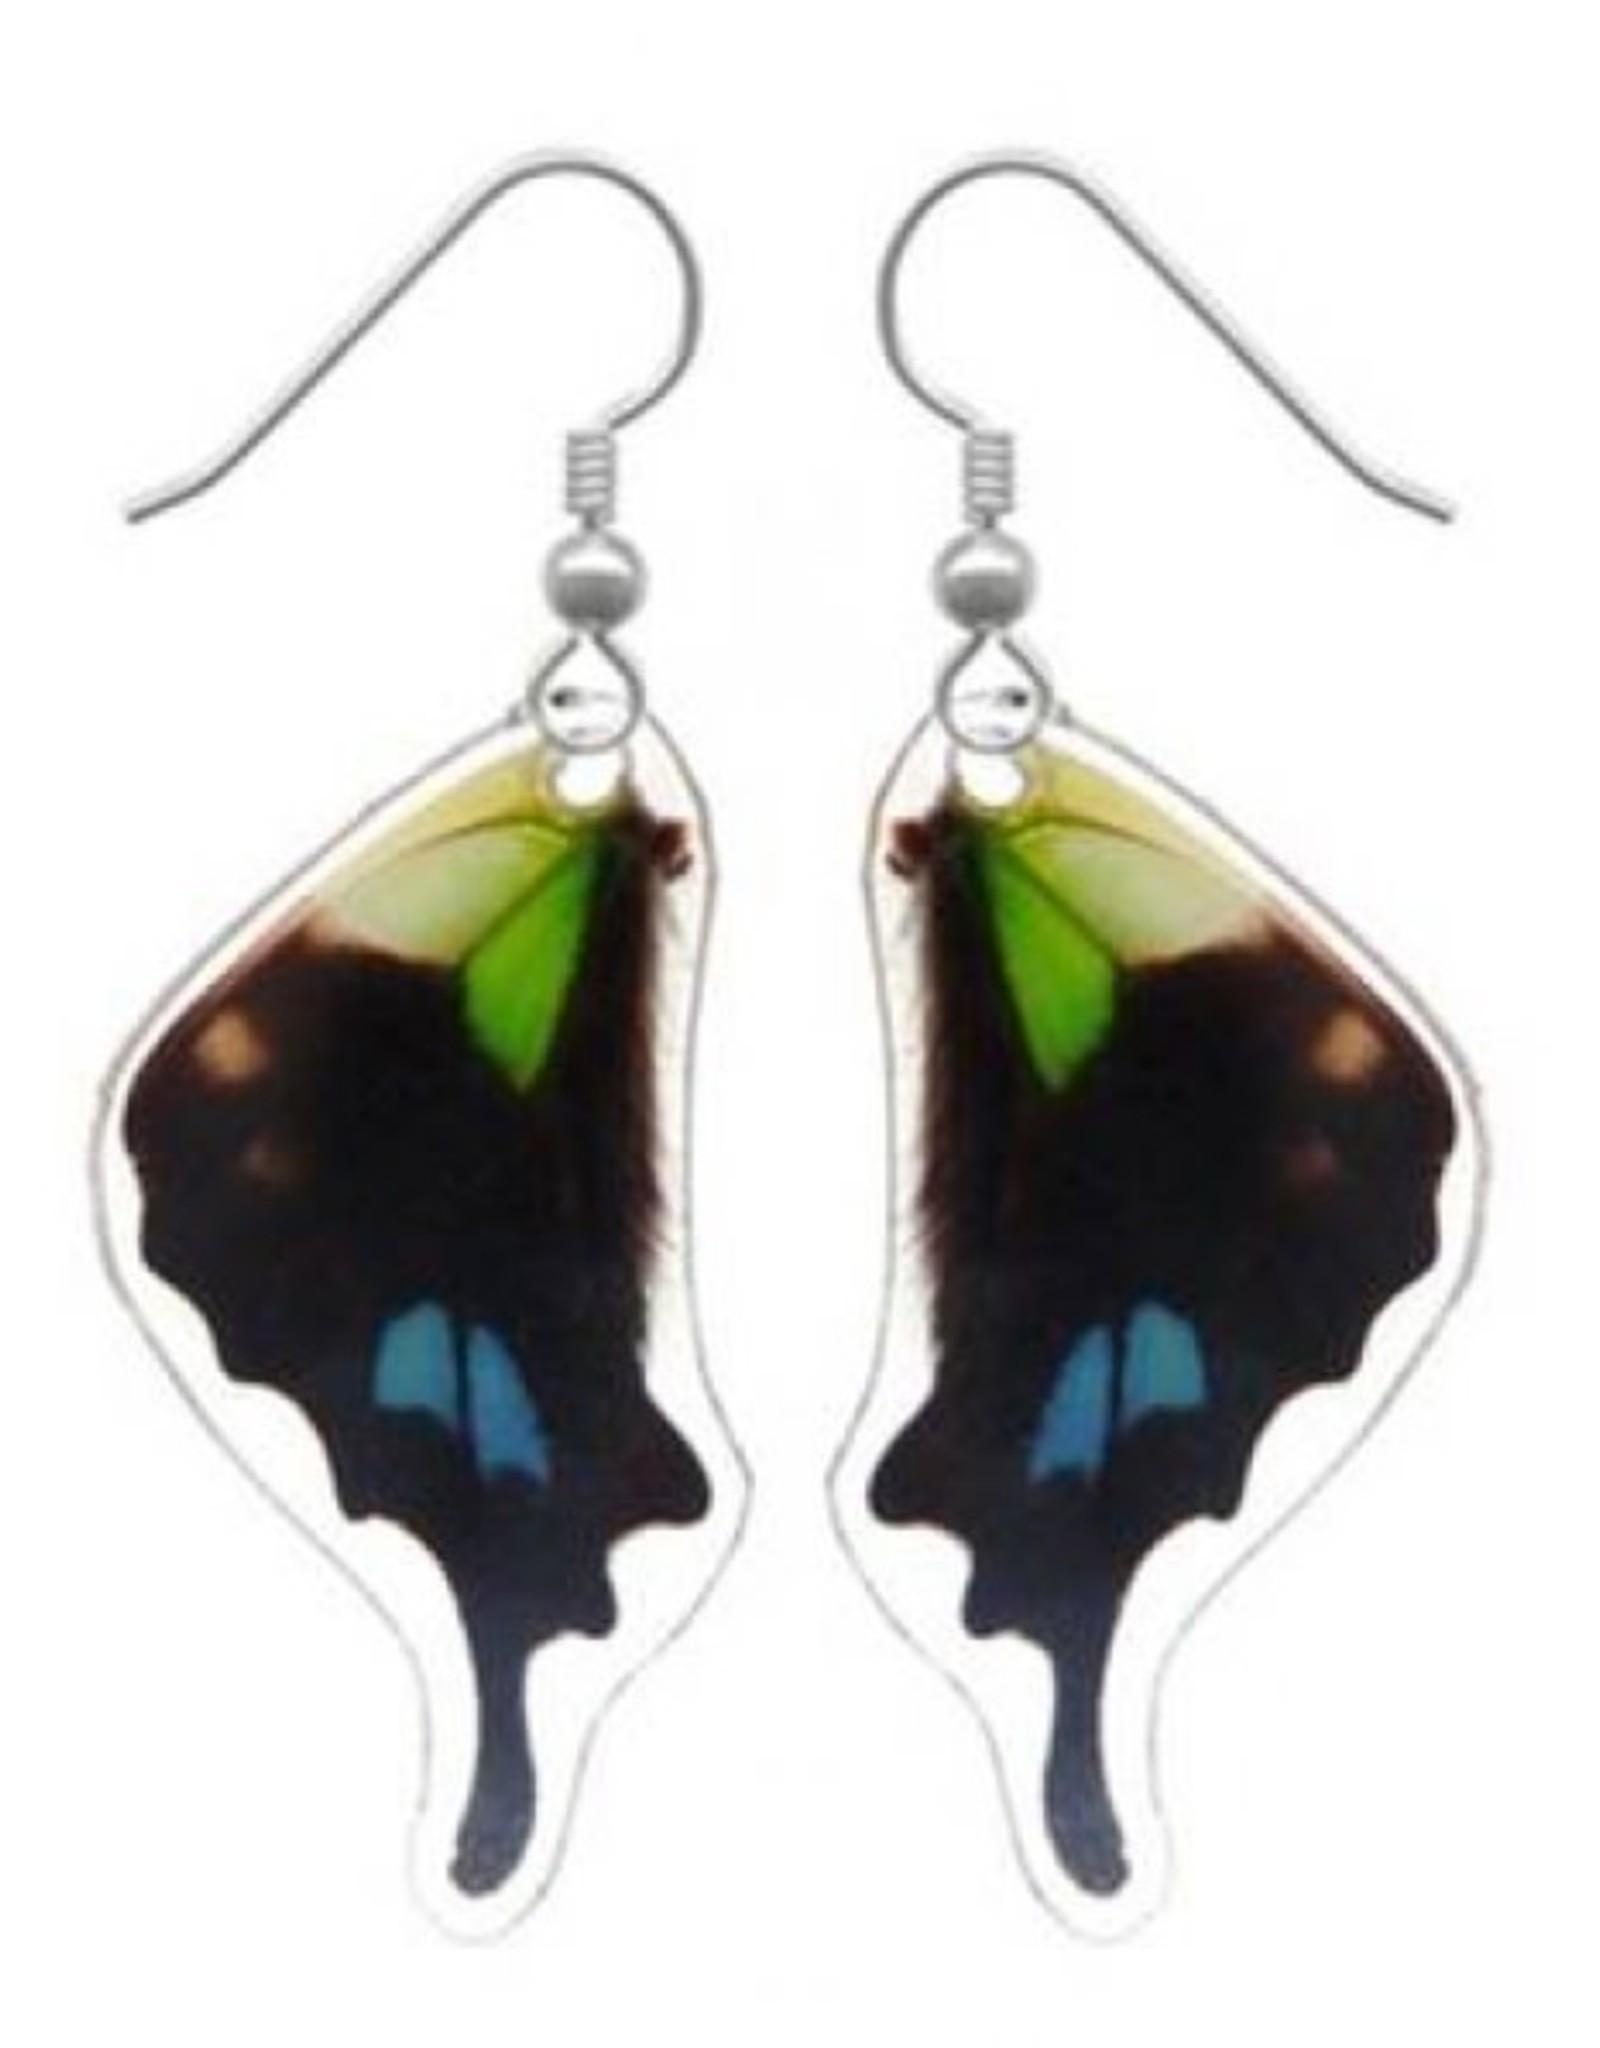 Asana Natural Arts Graphium Weiskei Bottom Wing Earrings, Laminated - Asana Natural Arts